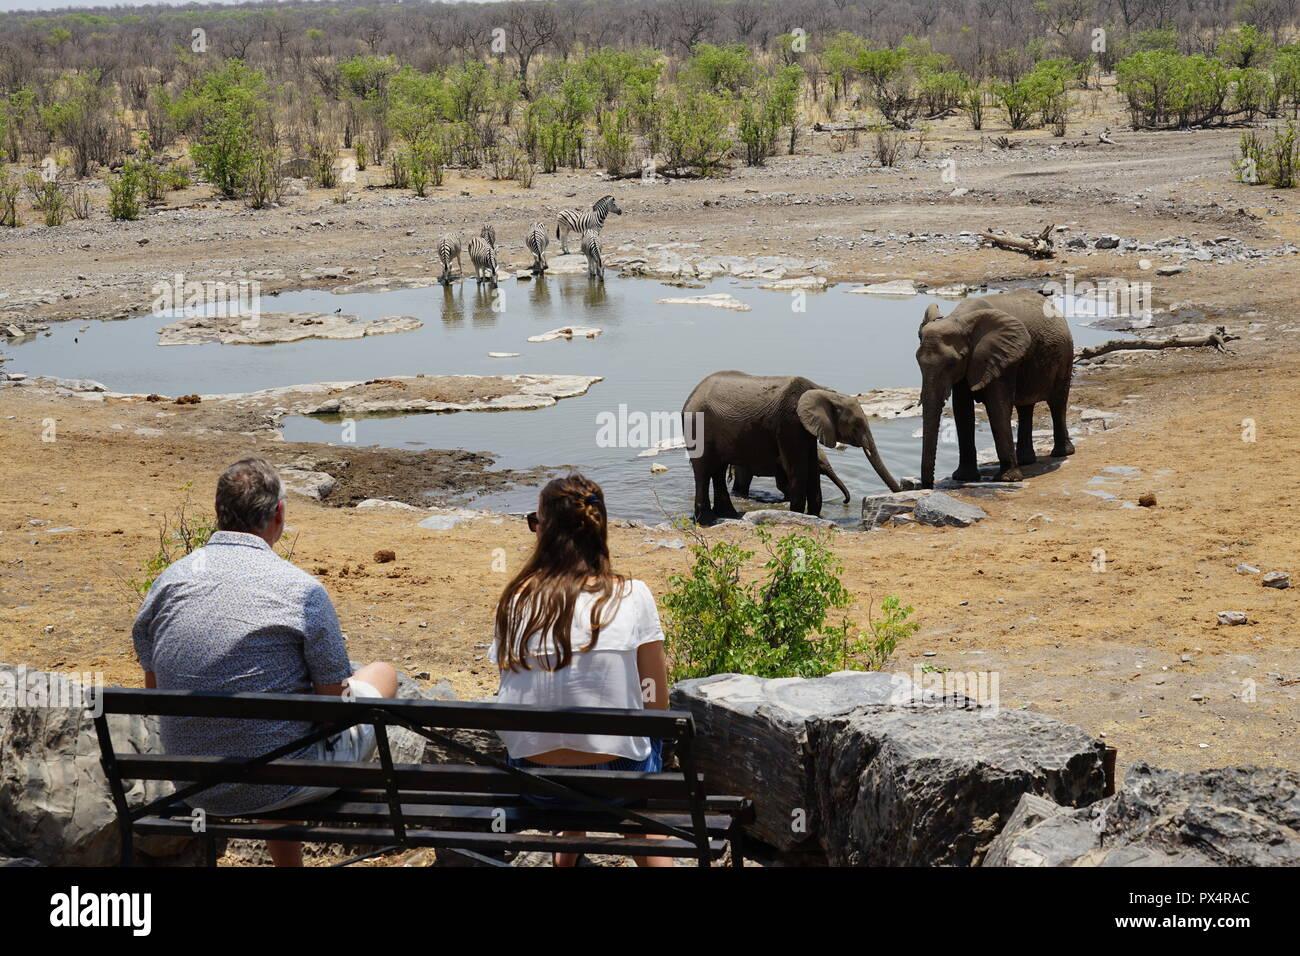 Touristen beobachten Elefanten am Elefanten am Halali Wasserloch, Etosha Nationalpark, Namibia, Afrika - Stock Image